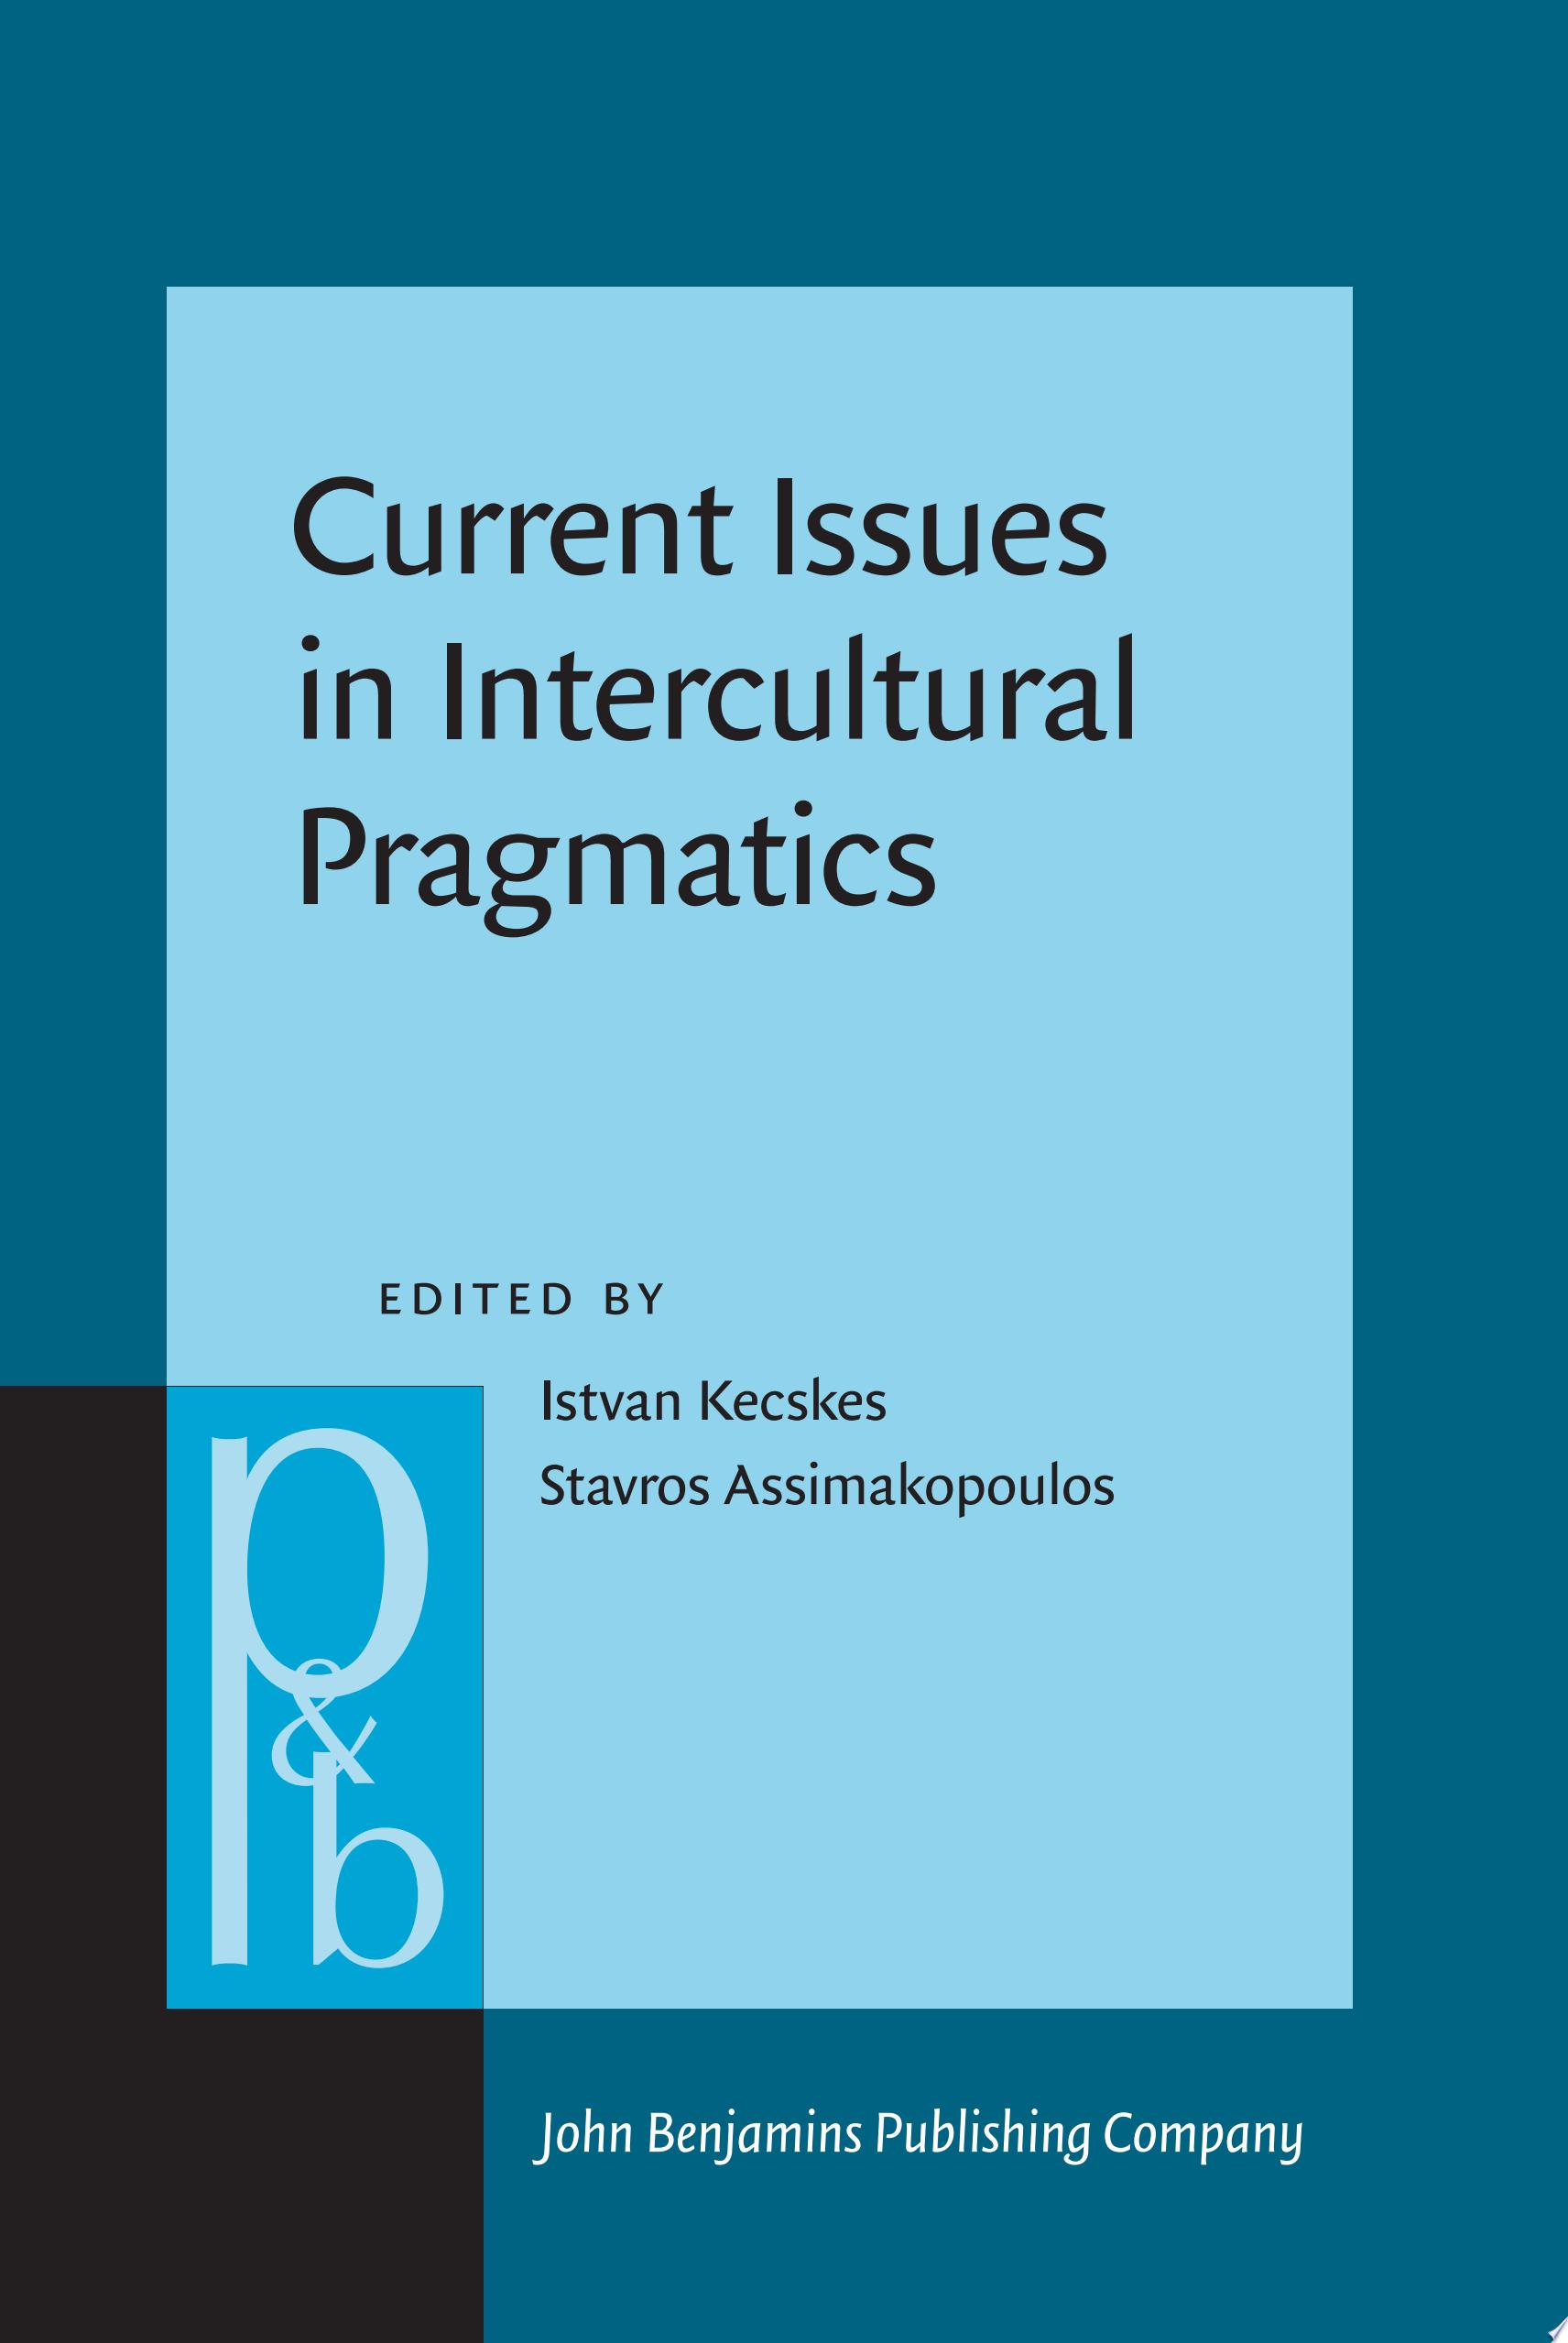 Current Issues in Intercultural Pragmatics